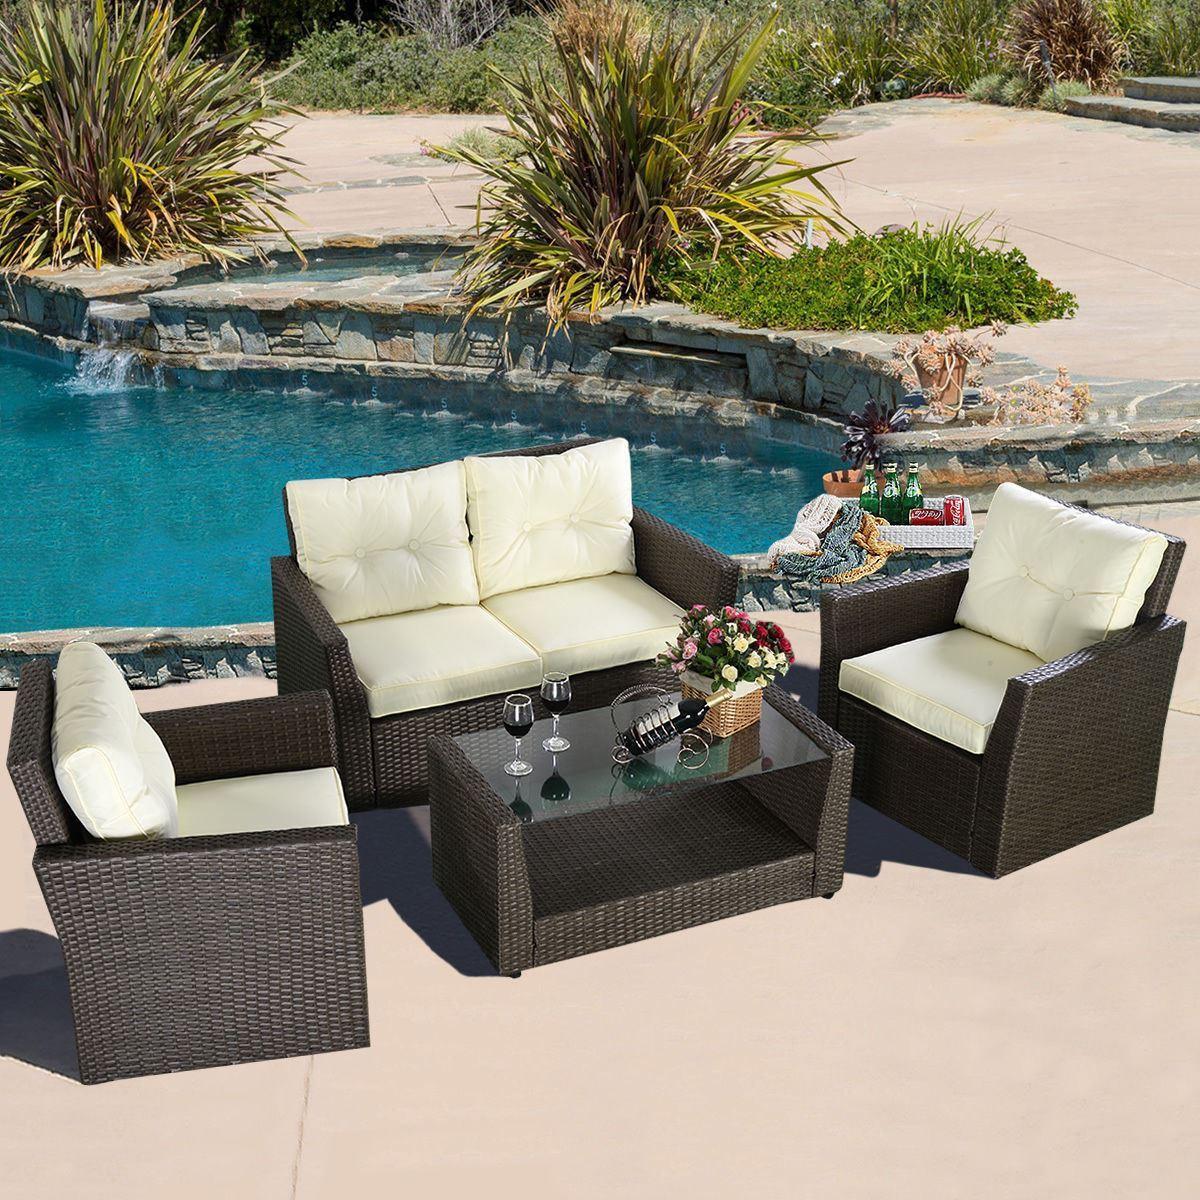 4PC Rattan Sofa Furniture Set Patio Garden Lawn Cushioned Seat